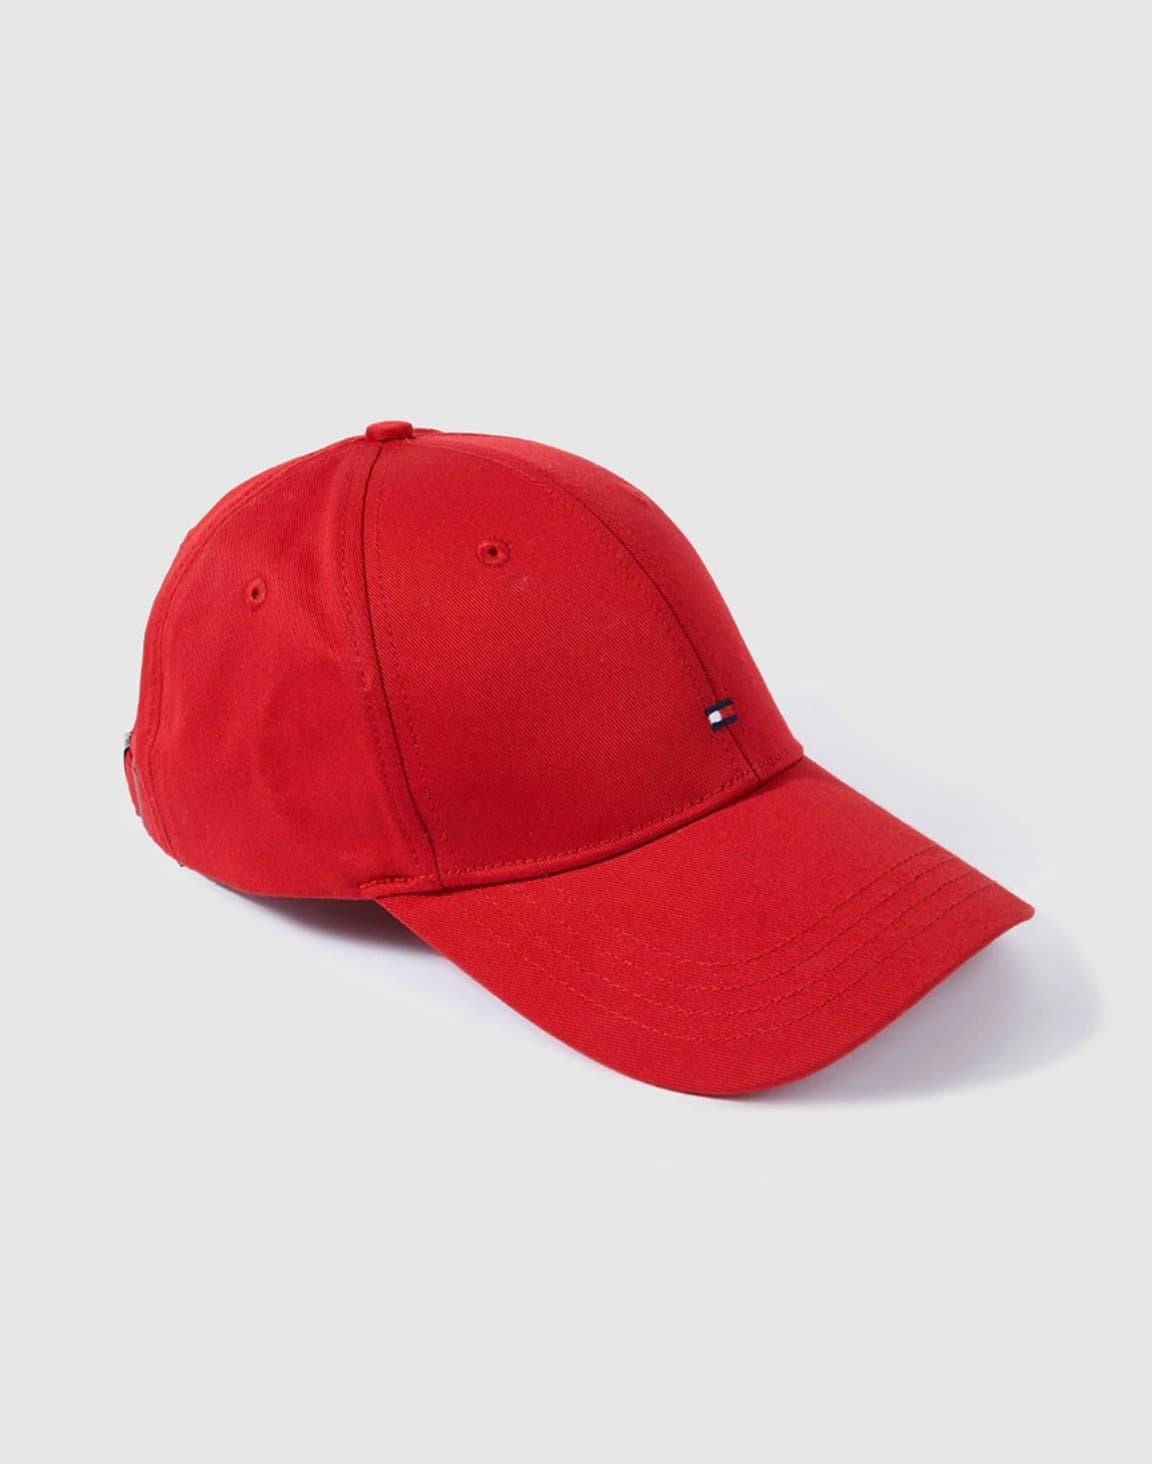 Gorra roja de Tommy Hilfiger